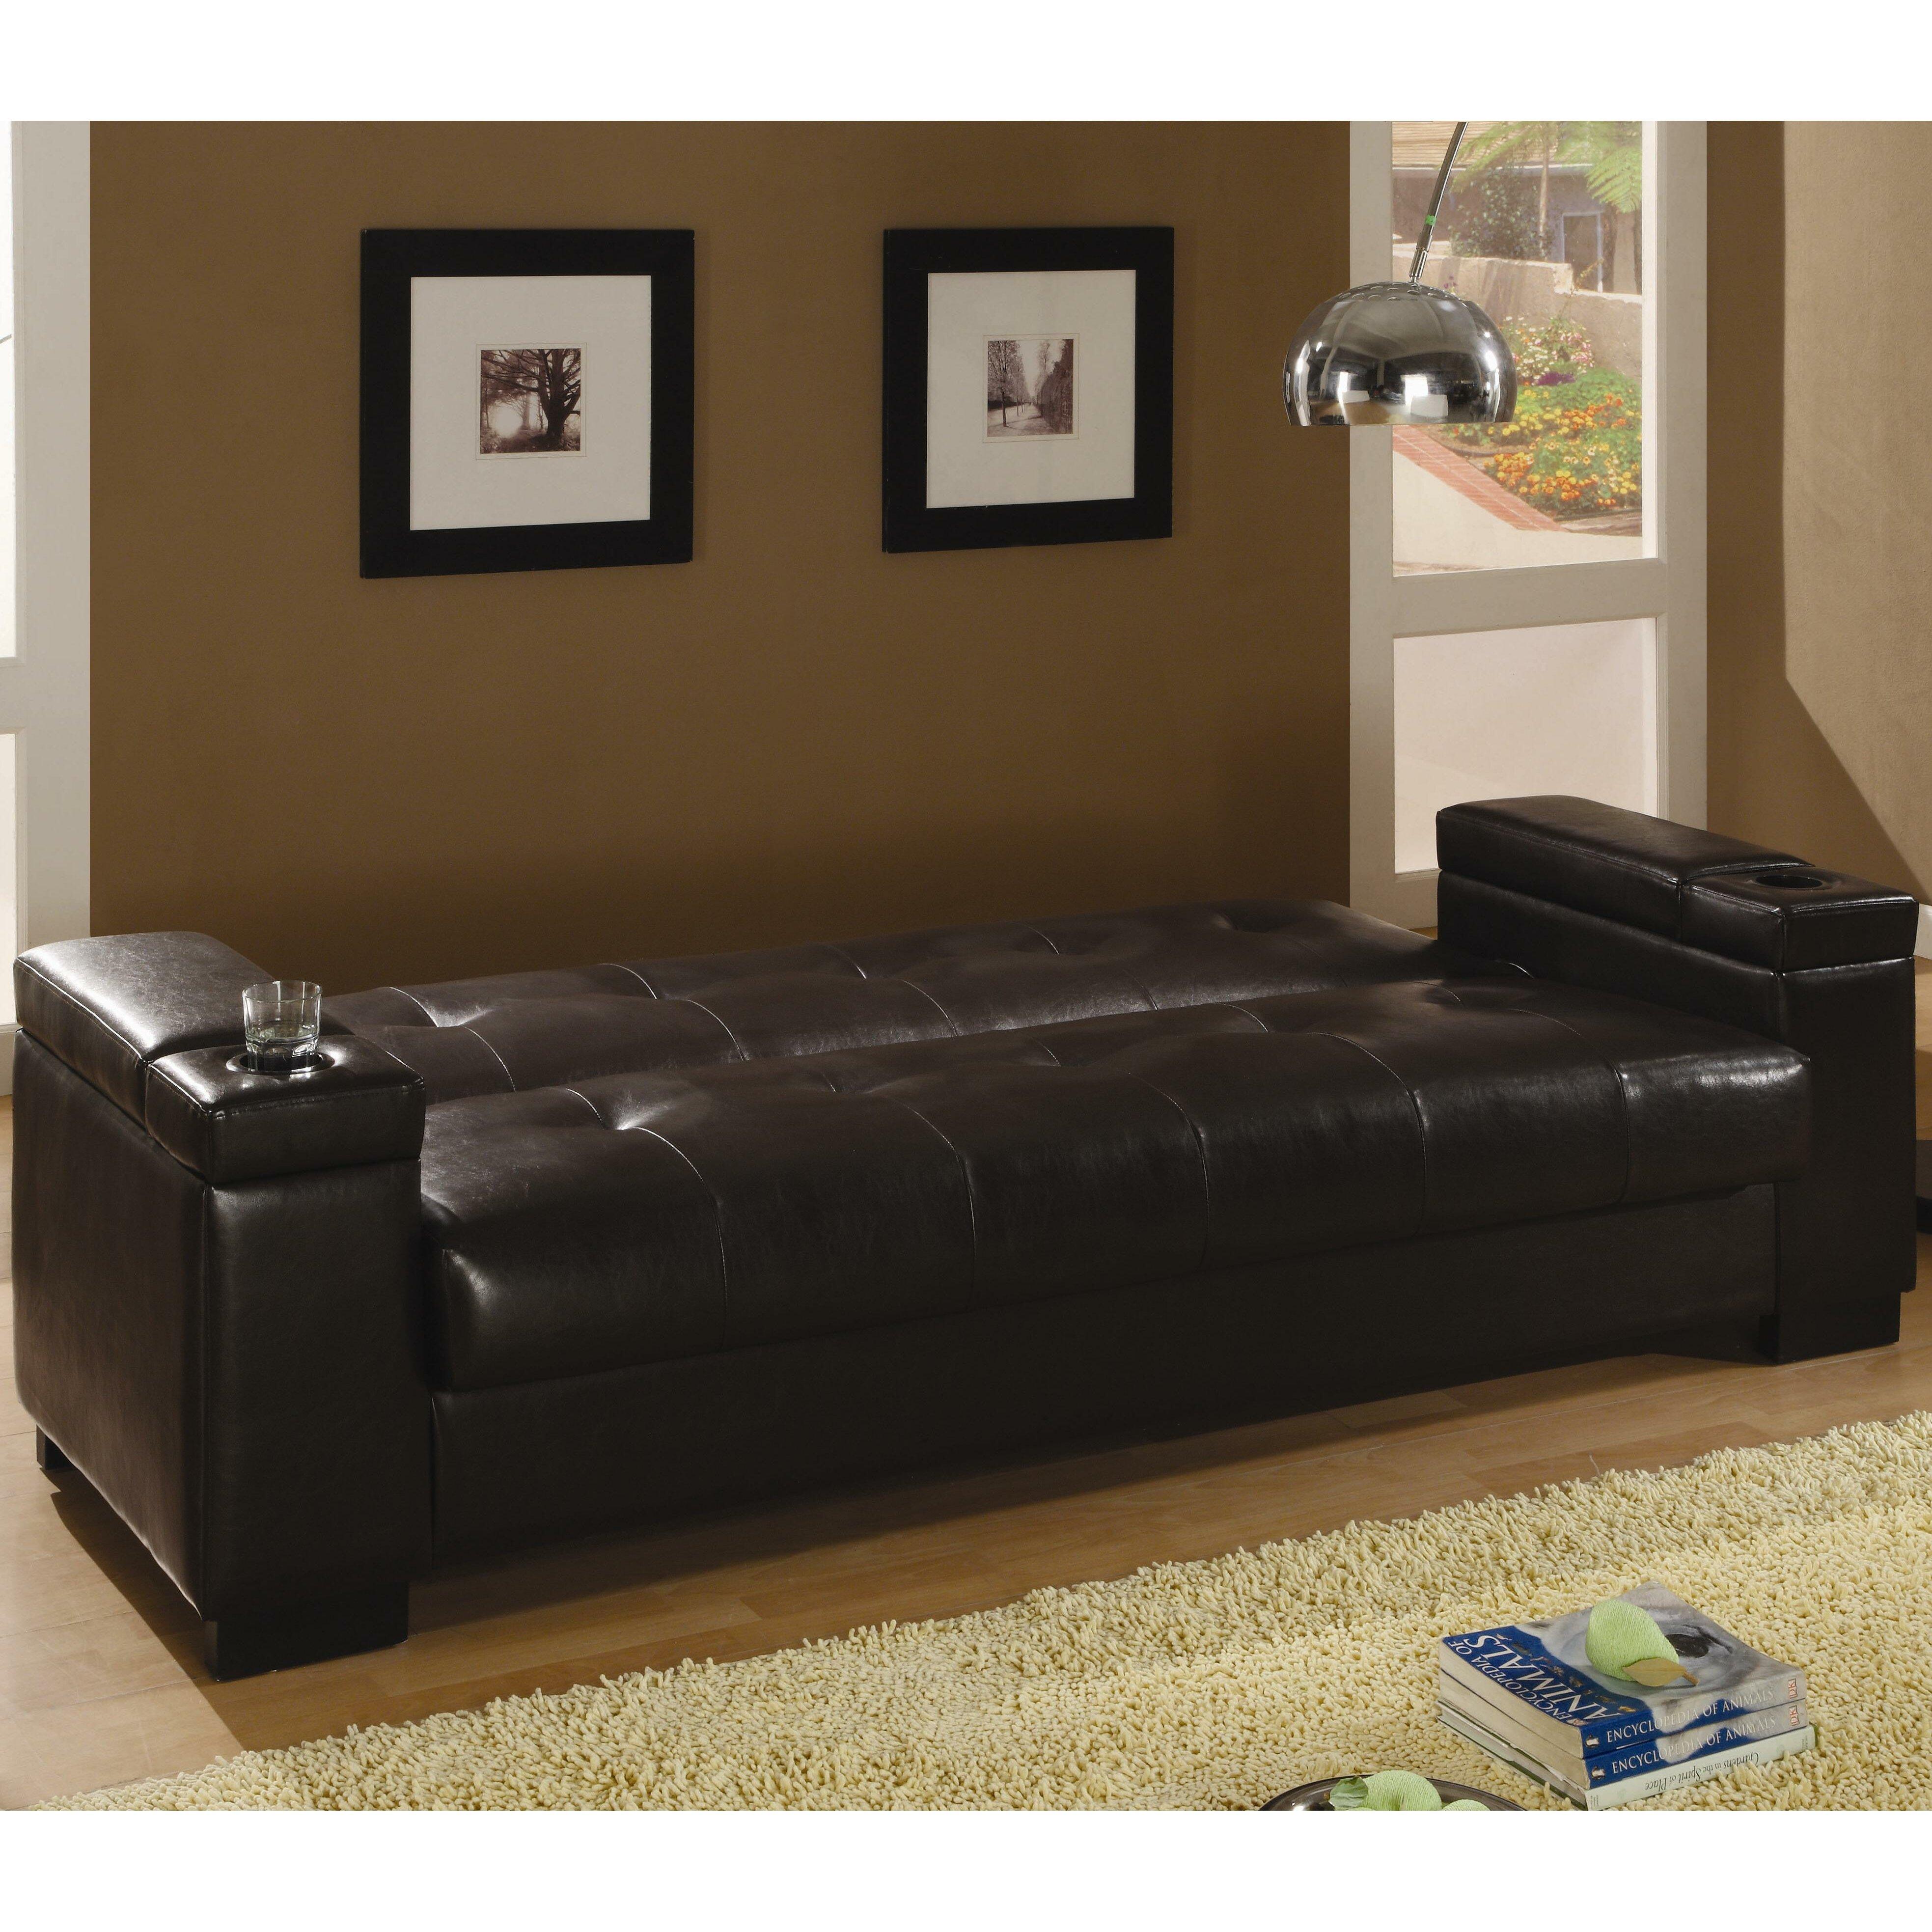 Wildon Home ® San Diego Sleeper Sofa & Reviews